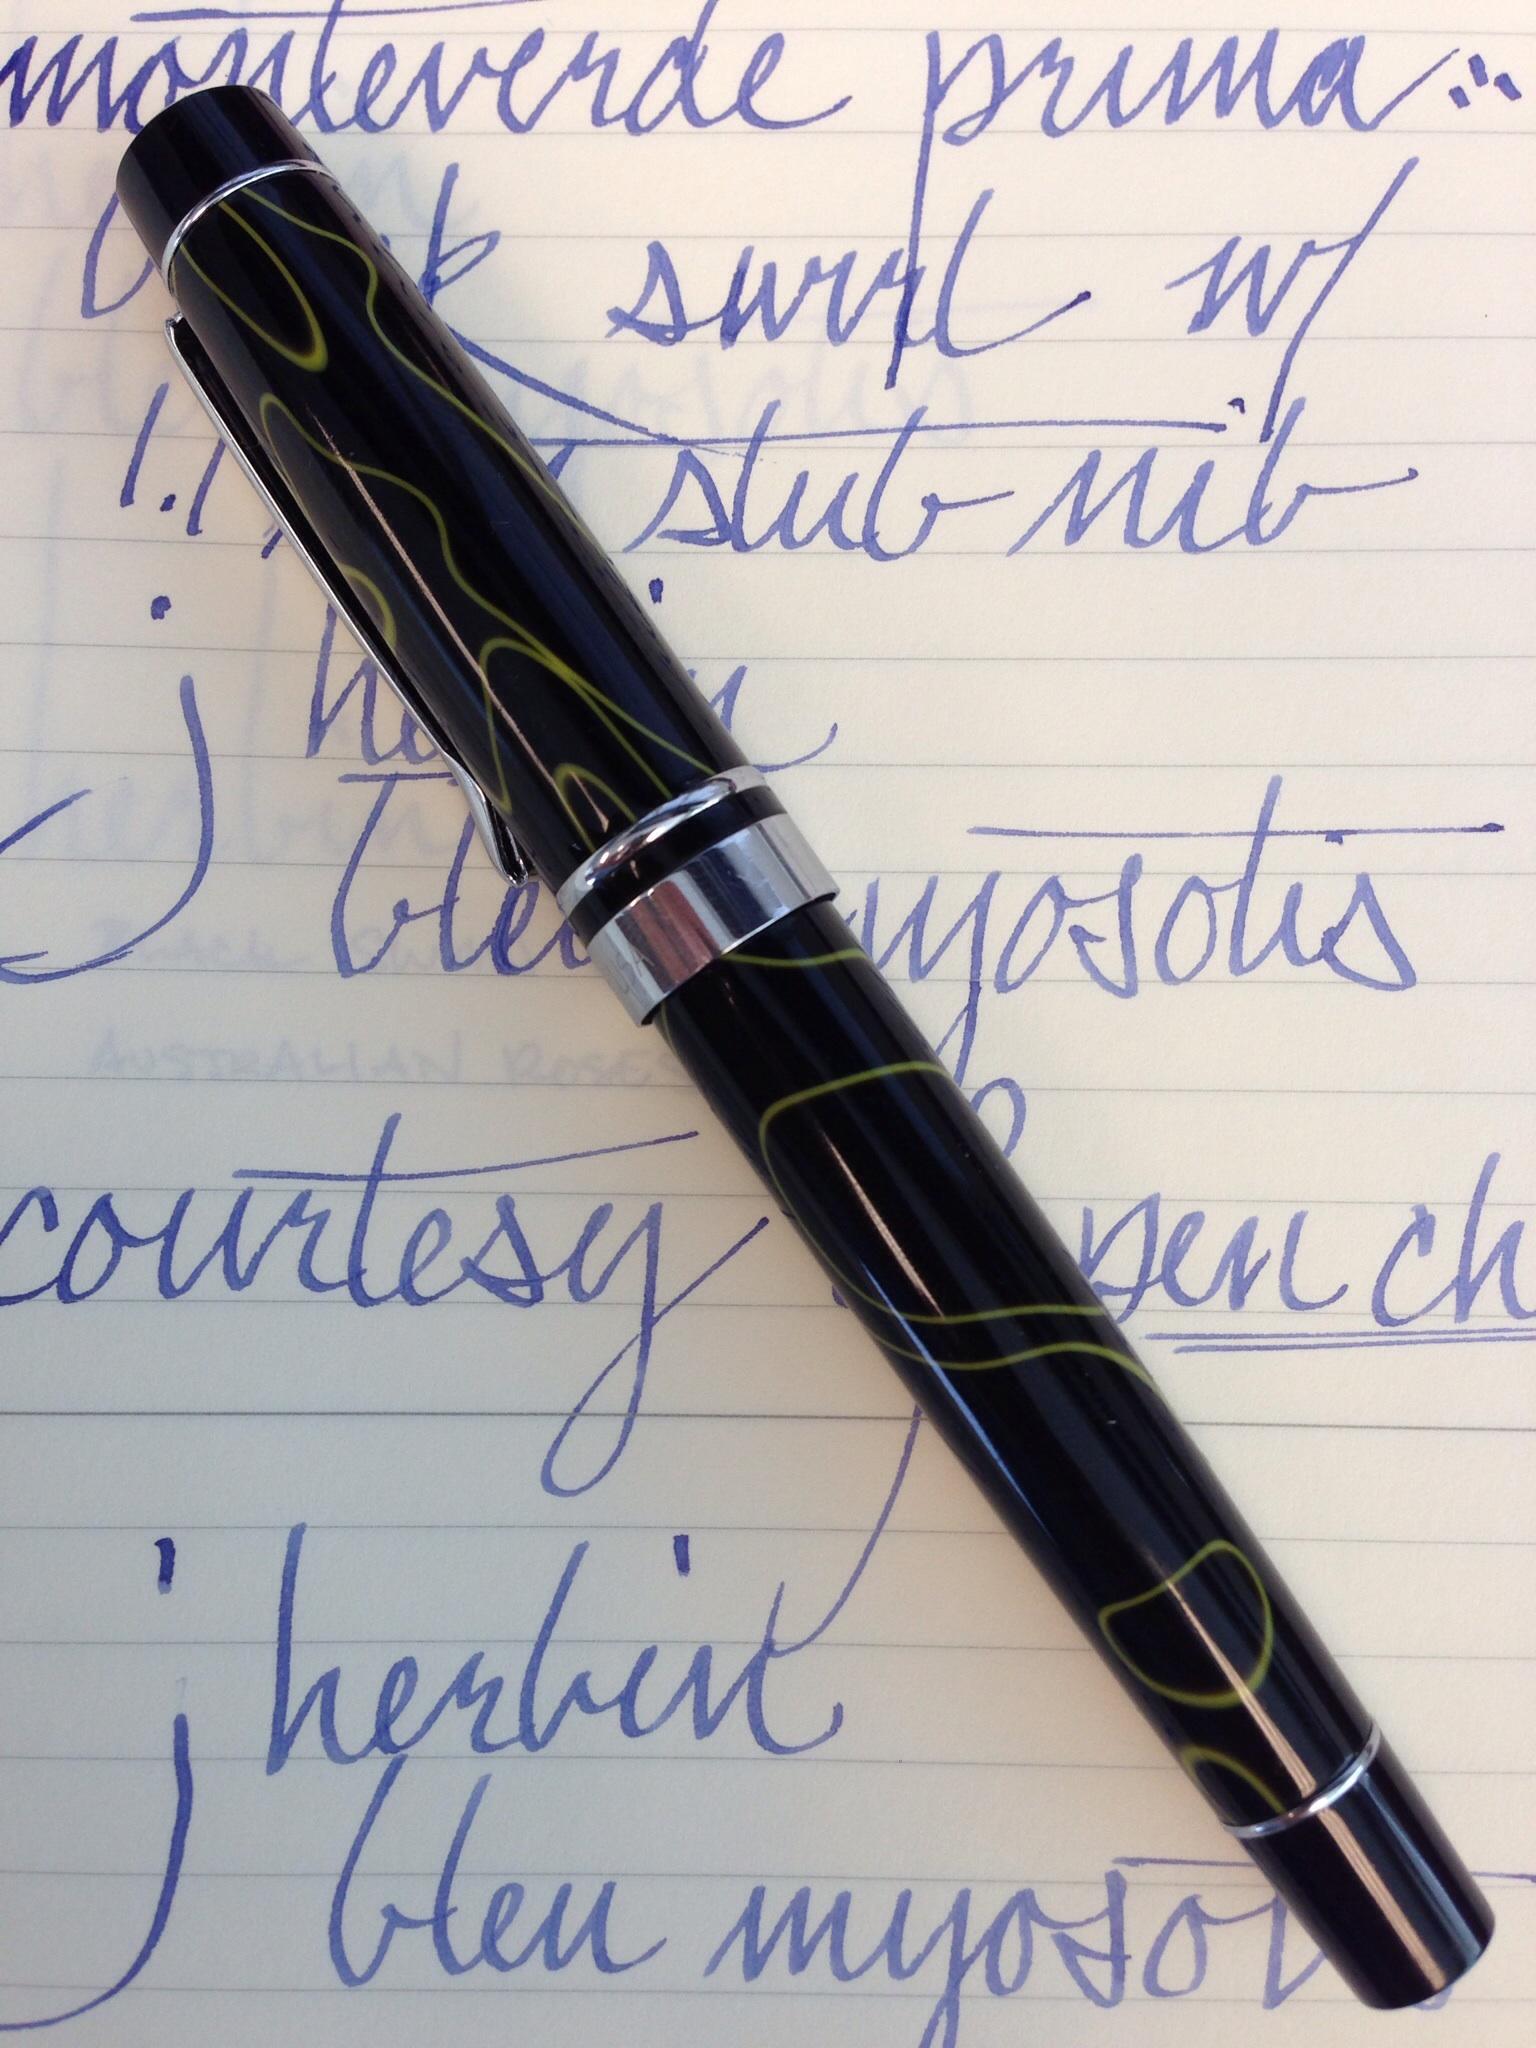 Monteverde Prima Black Swirl w/ 1.1mm Stub Nib